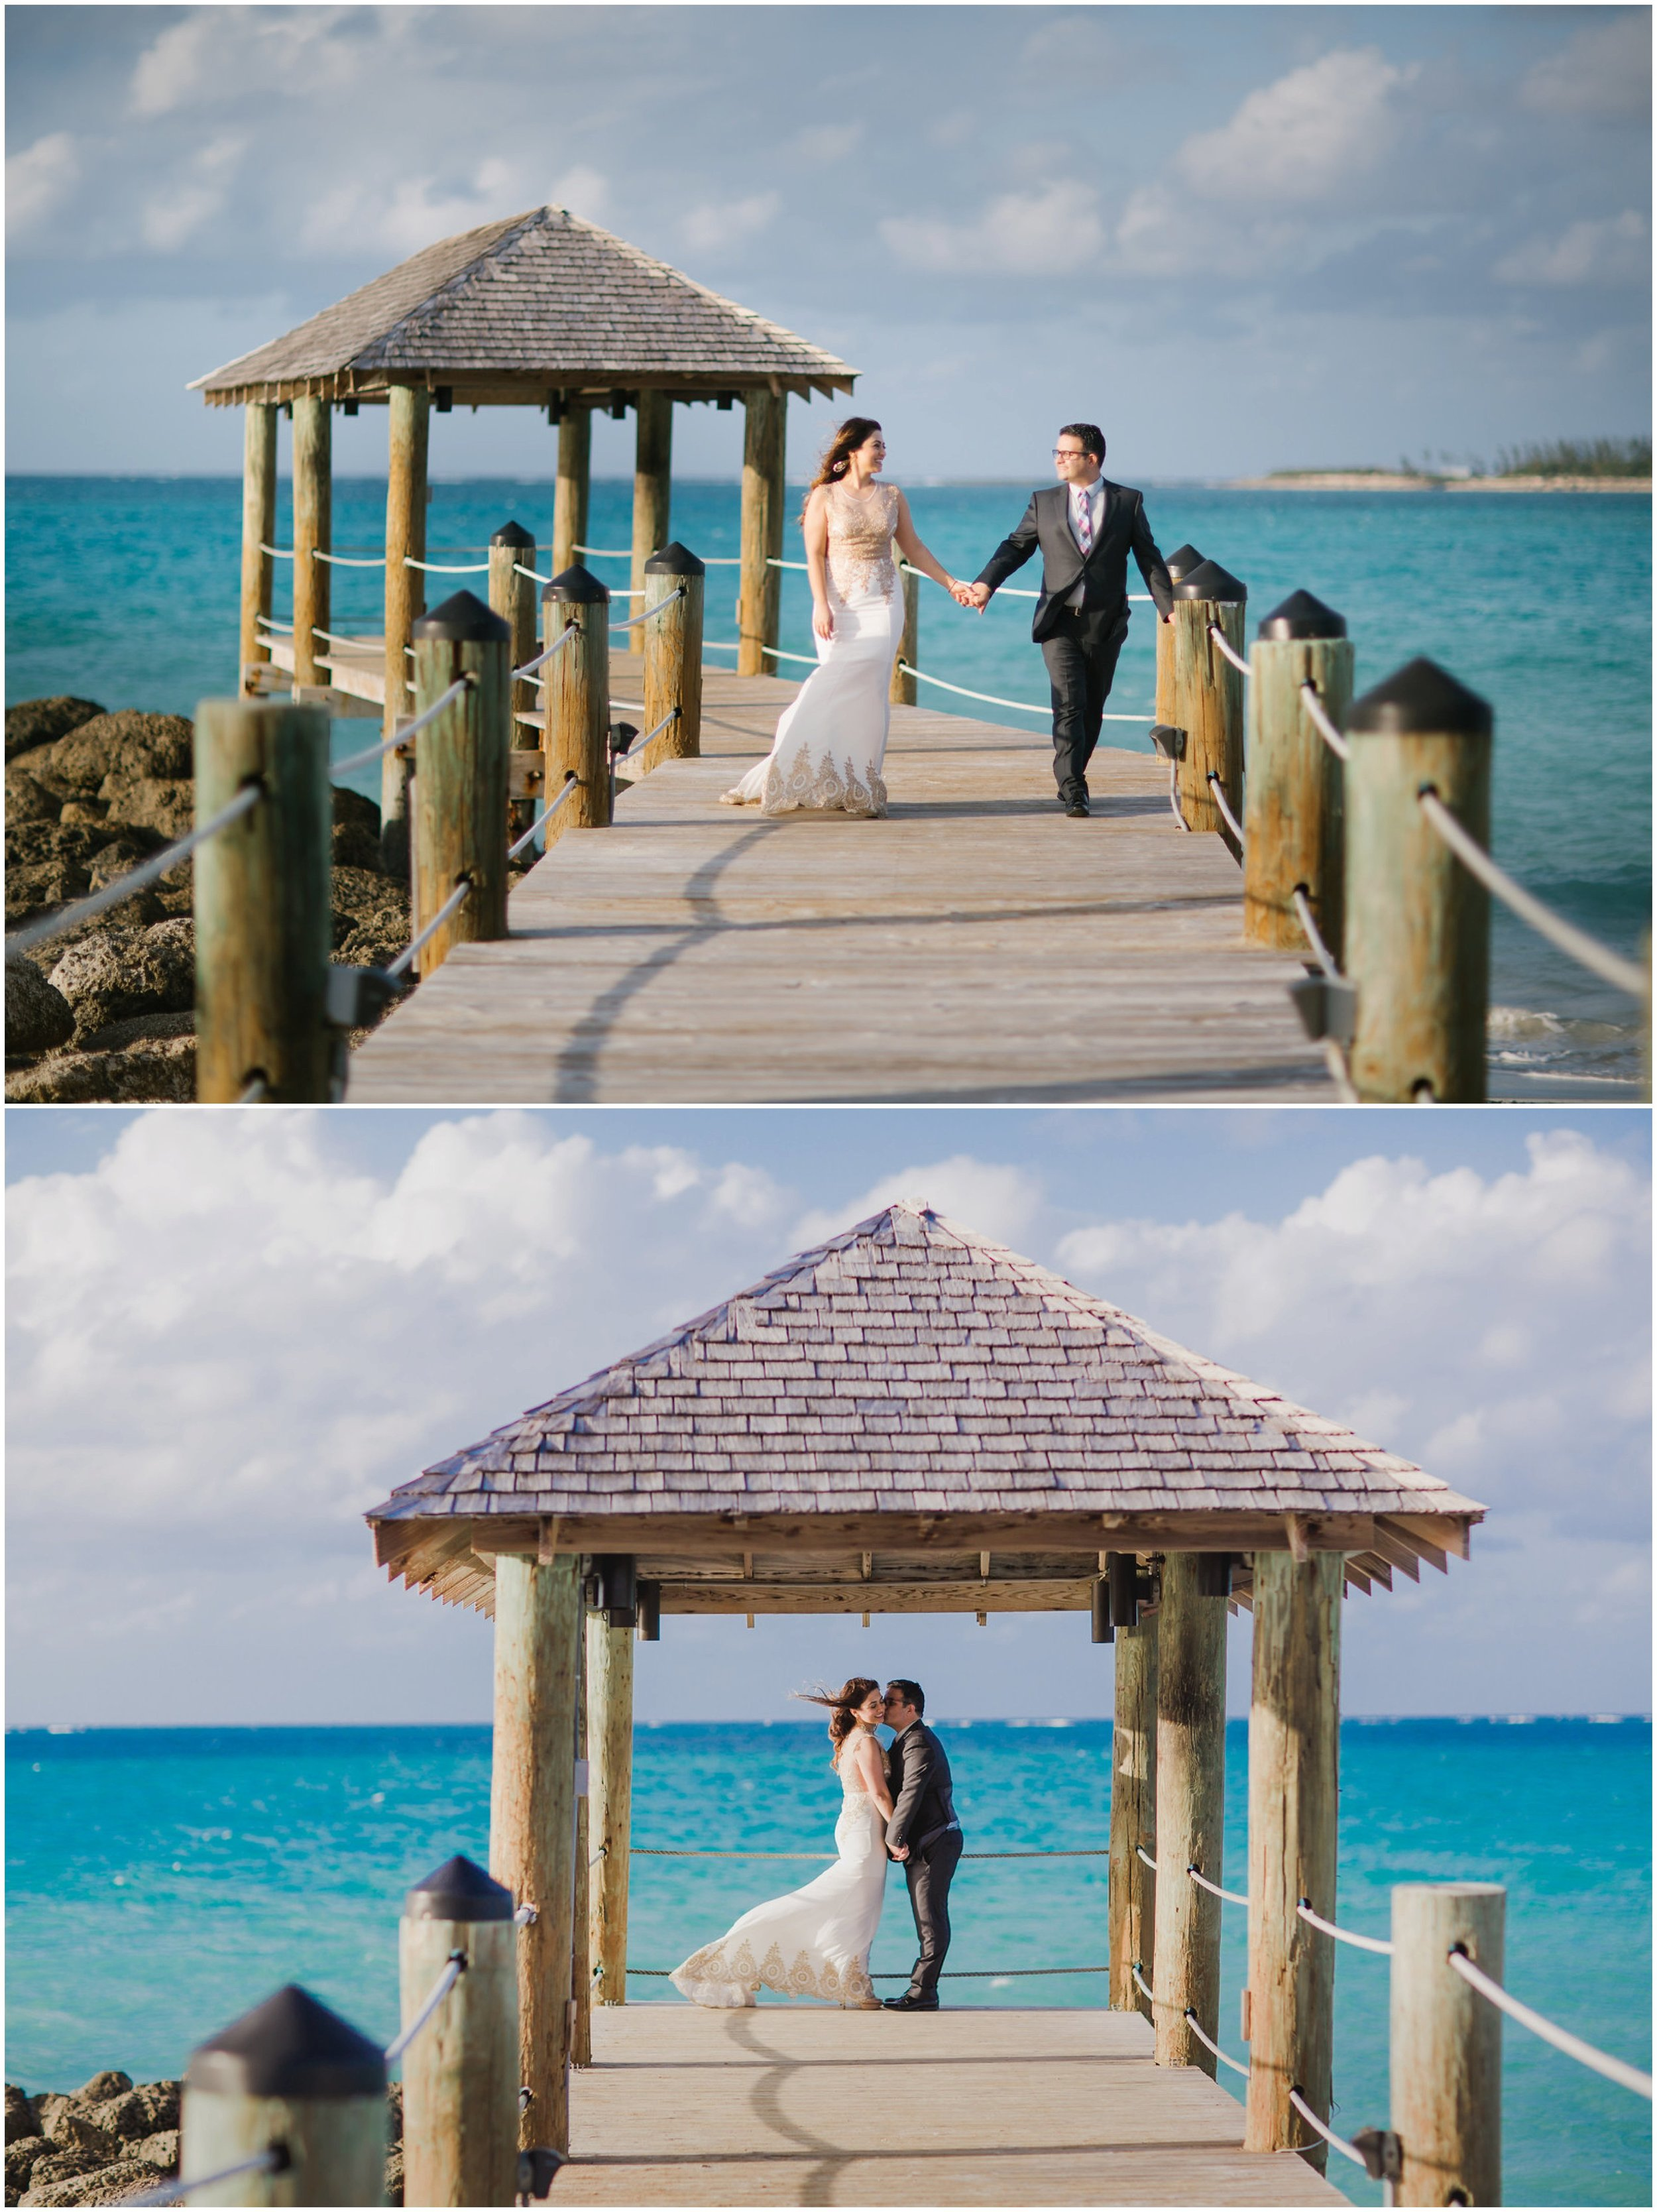 Le Cape Weddings- Destination Wedding Photography -ShayanandNikkie-2-X3_LuxuryDestinationPhotographer.jpg